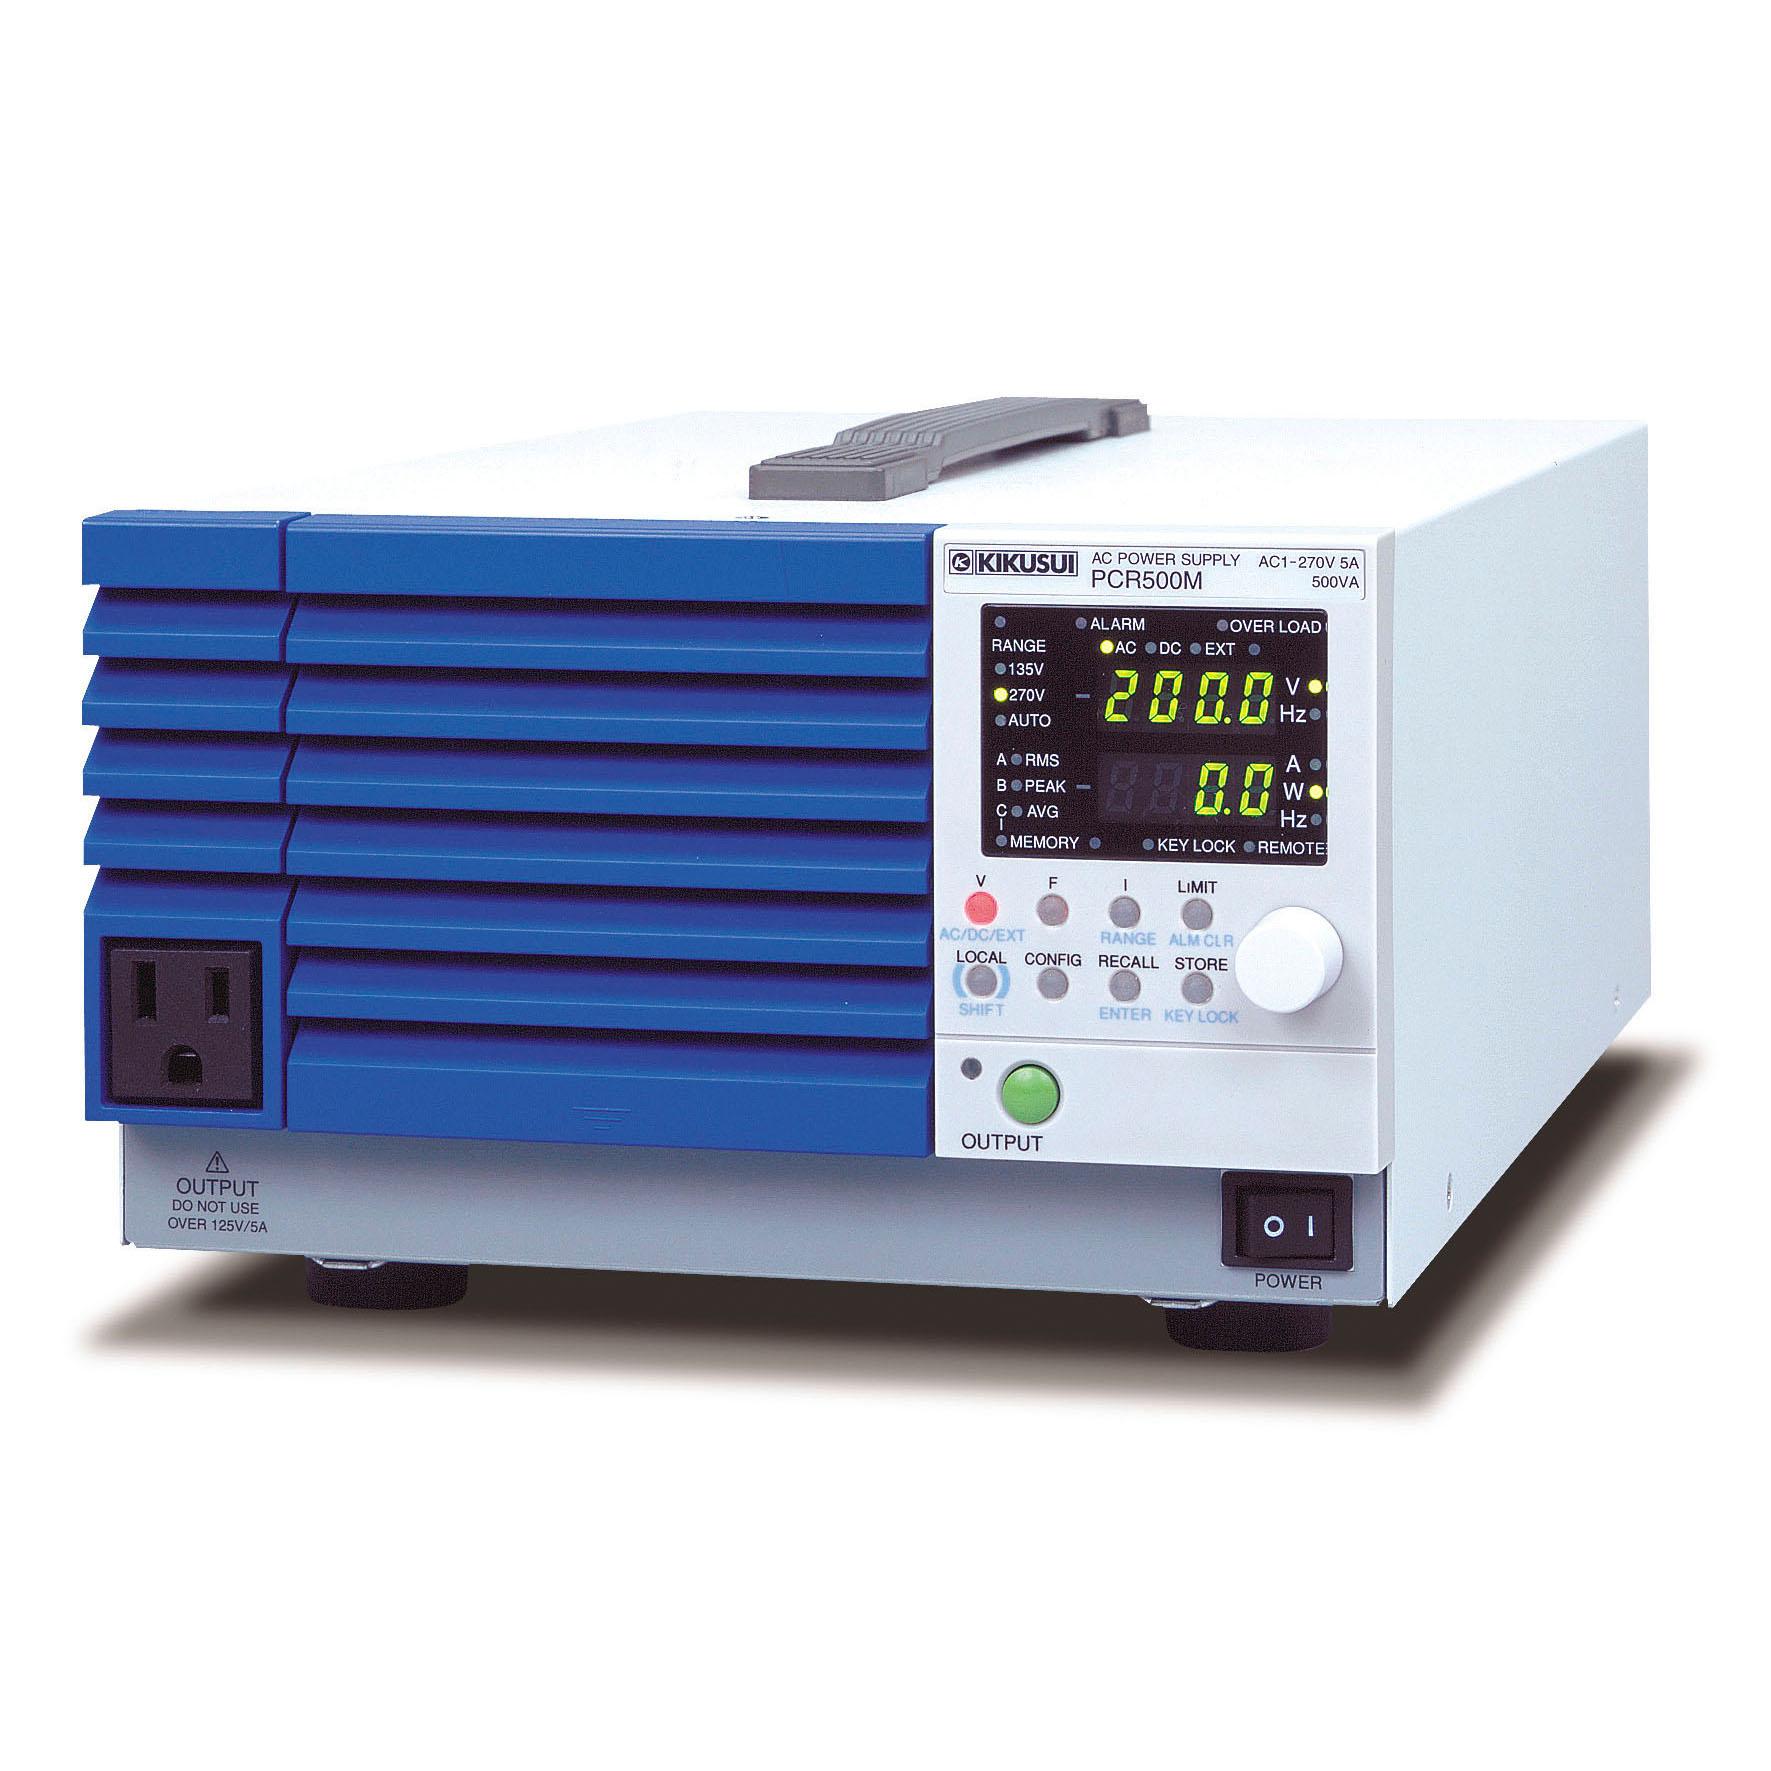 PCR500M コンパクト交流電源